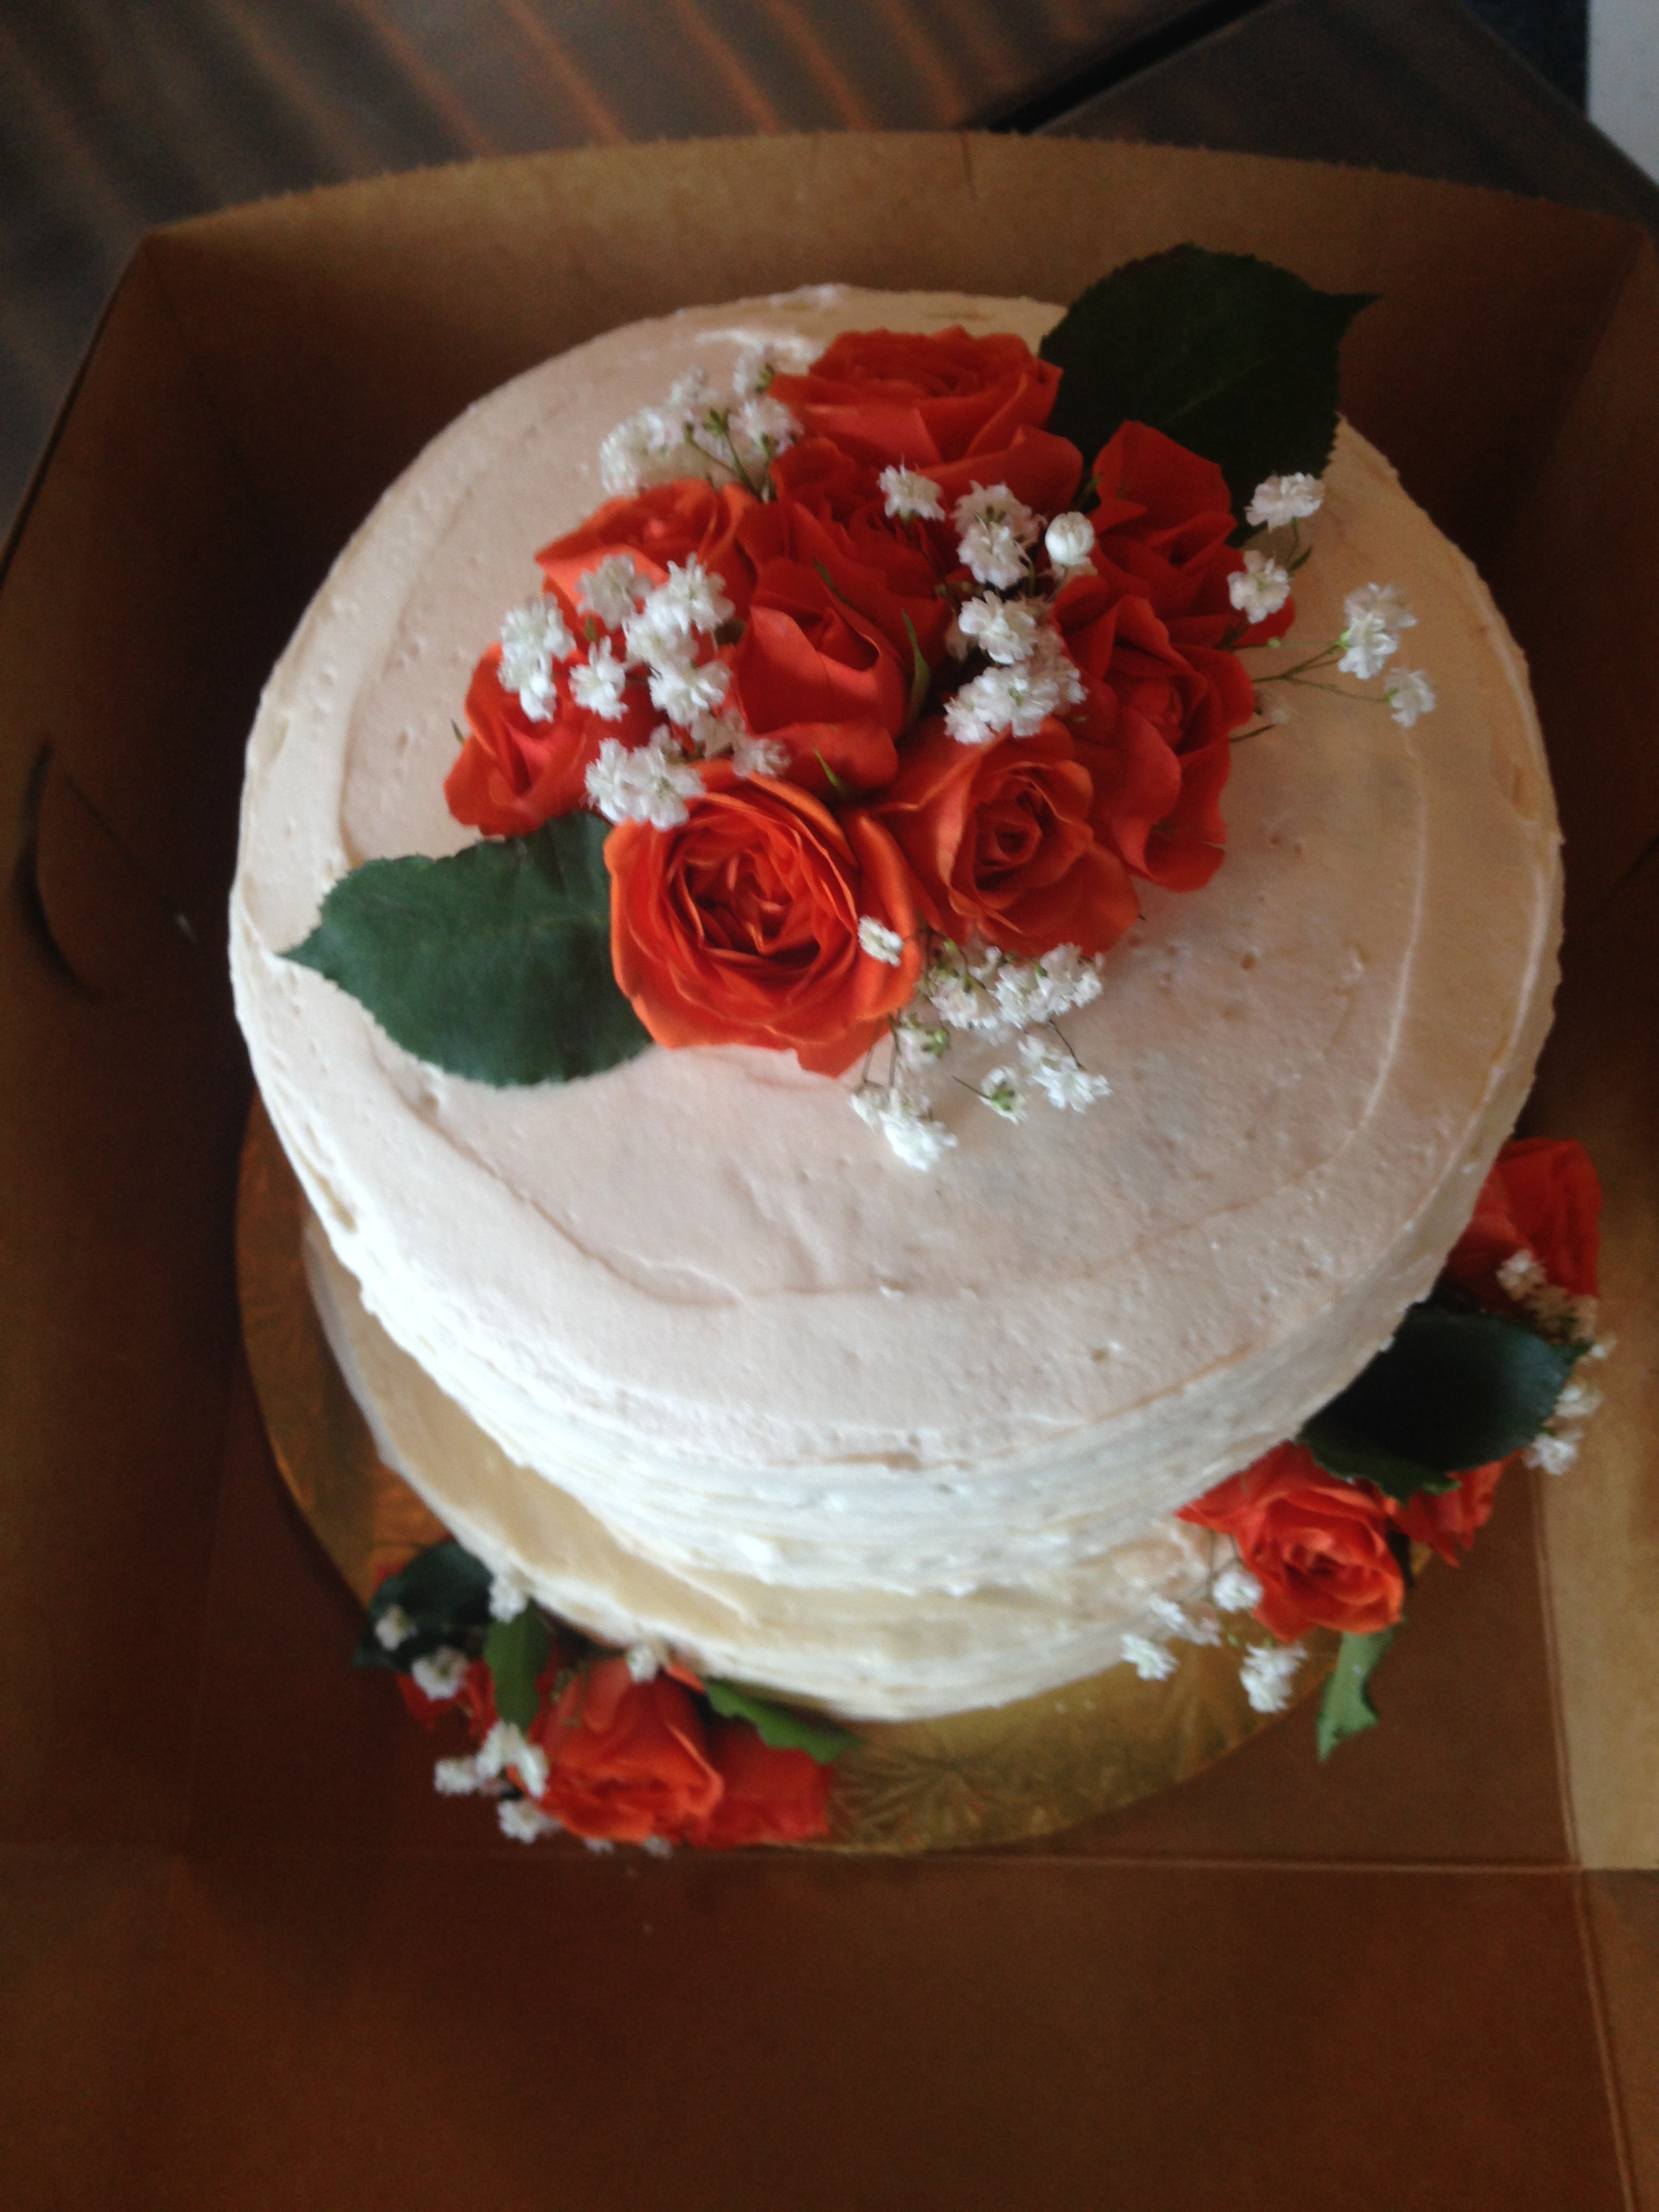 Vegan & GF Wedding Cake Consultation